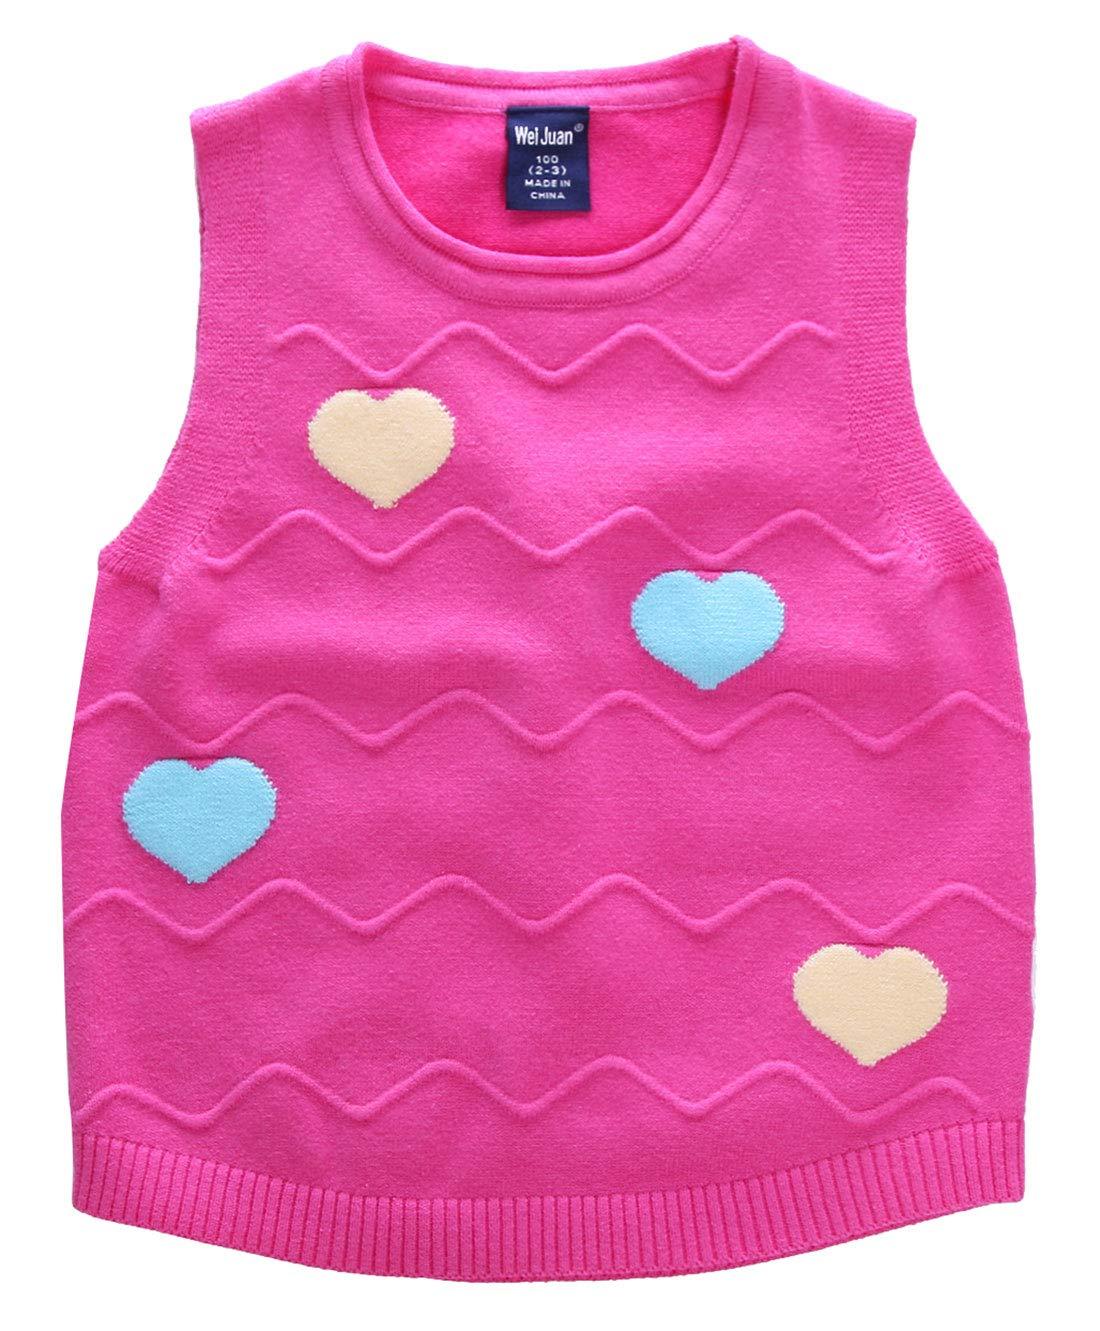 Big Girls Vest Crewneck Sweater Sleeveless Pullover Colored Love Hearts Waistcoat 6-7T Rose